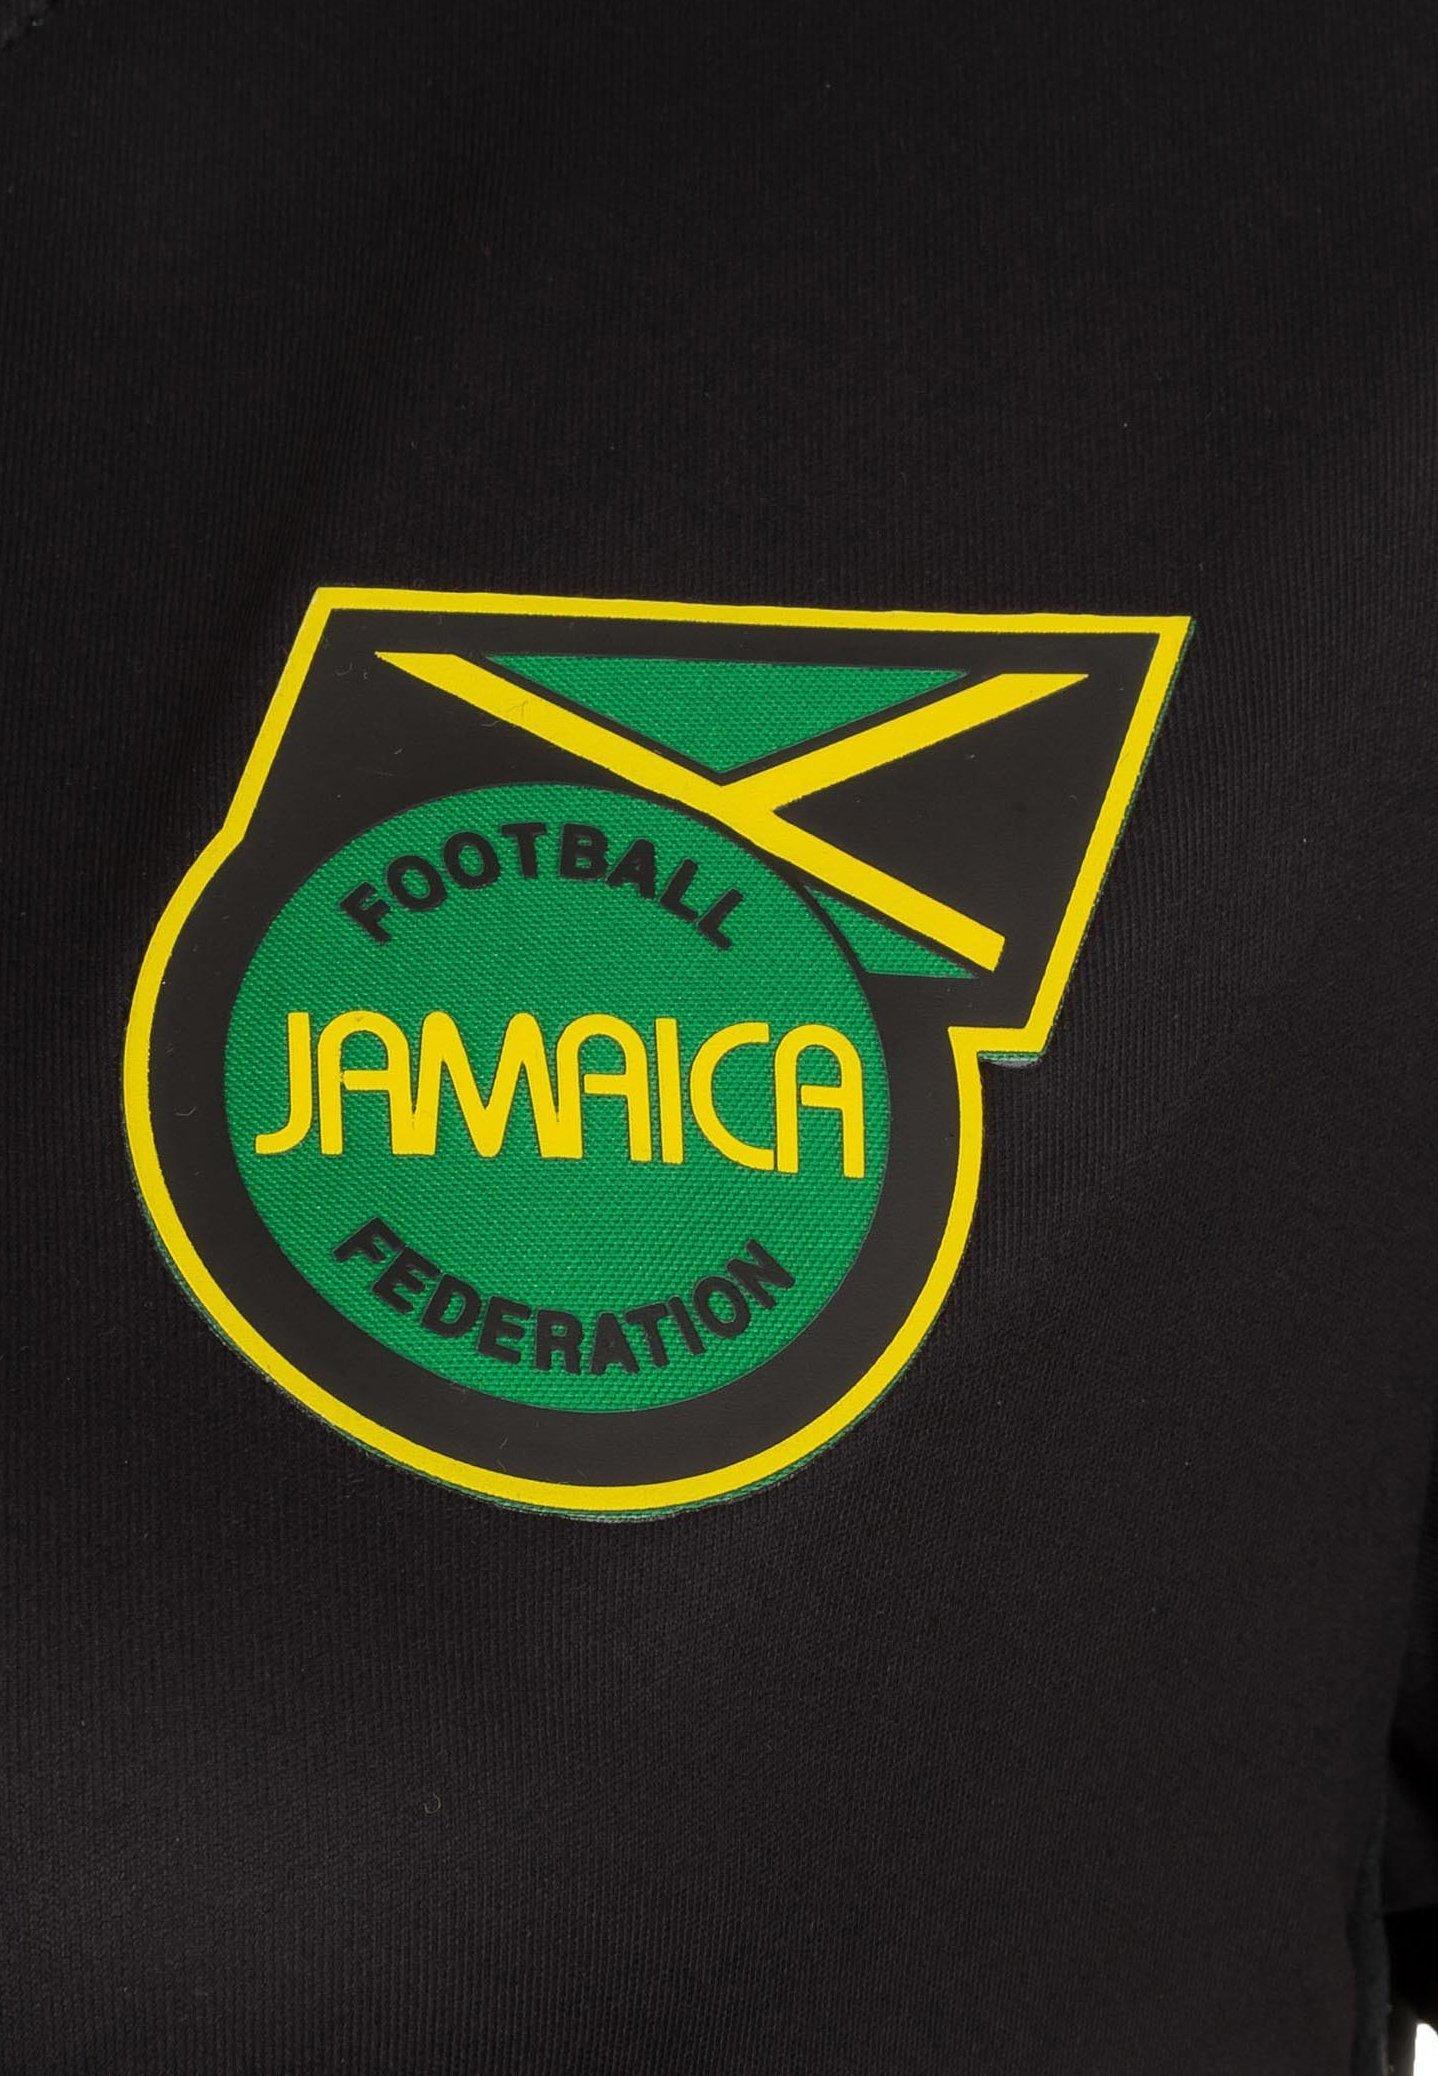 Umbro Jamaika Trikot Away Wm- Fanartikel Black lrncFrK8